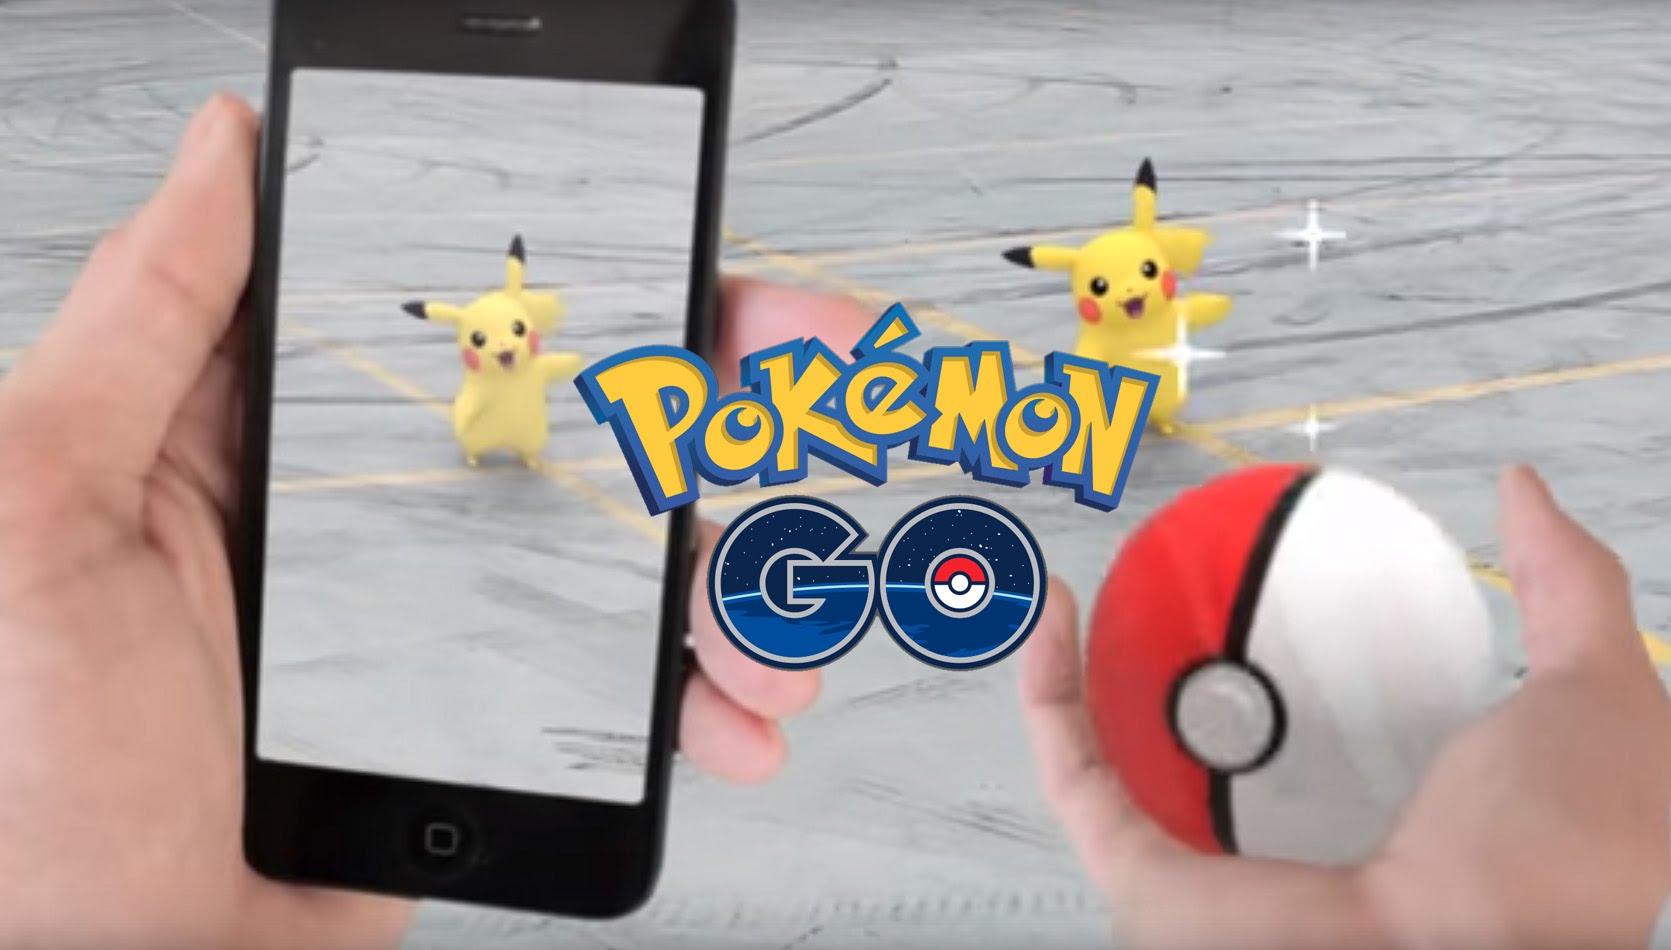 Pokémon GO desembarcó en Argentina